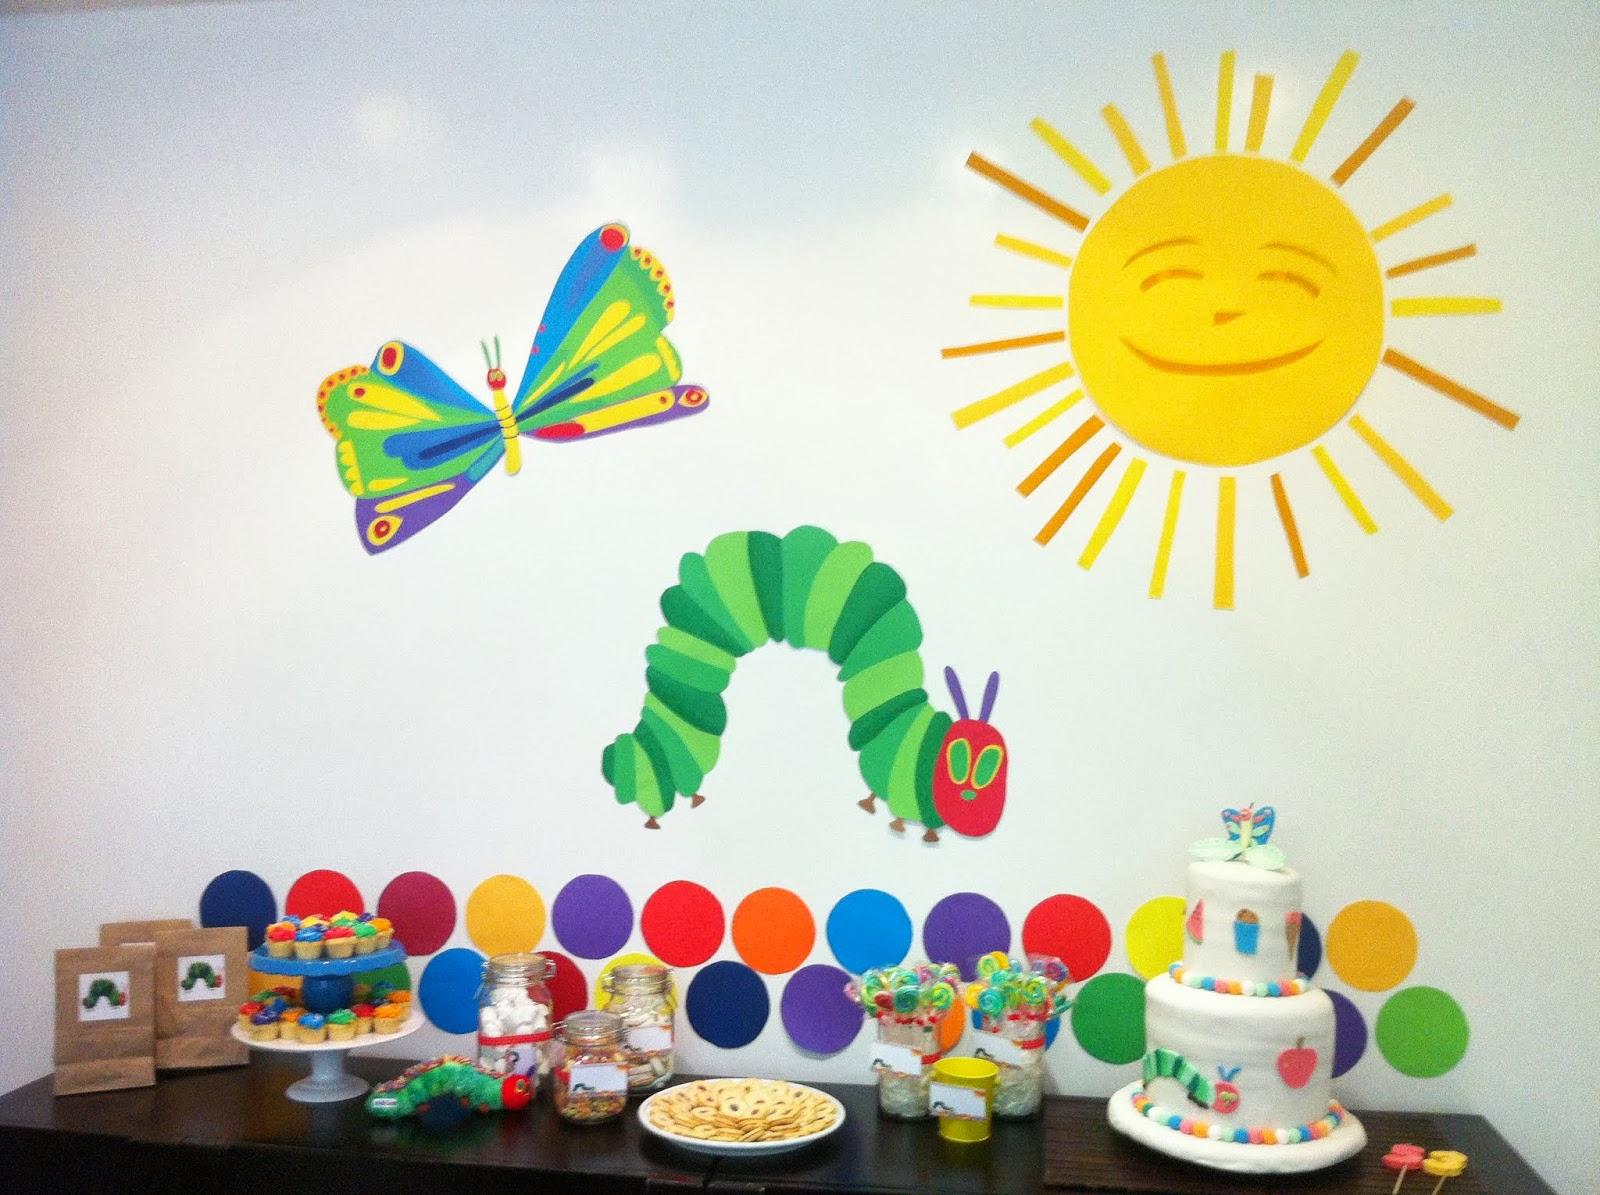 Montessori Classroom Wall Decoration : The gallery for gt montessori classroom wall decoration